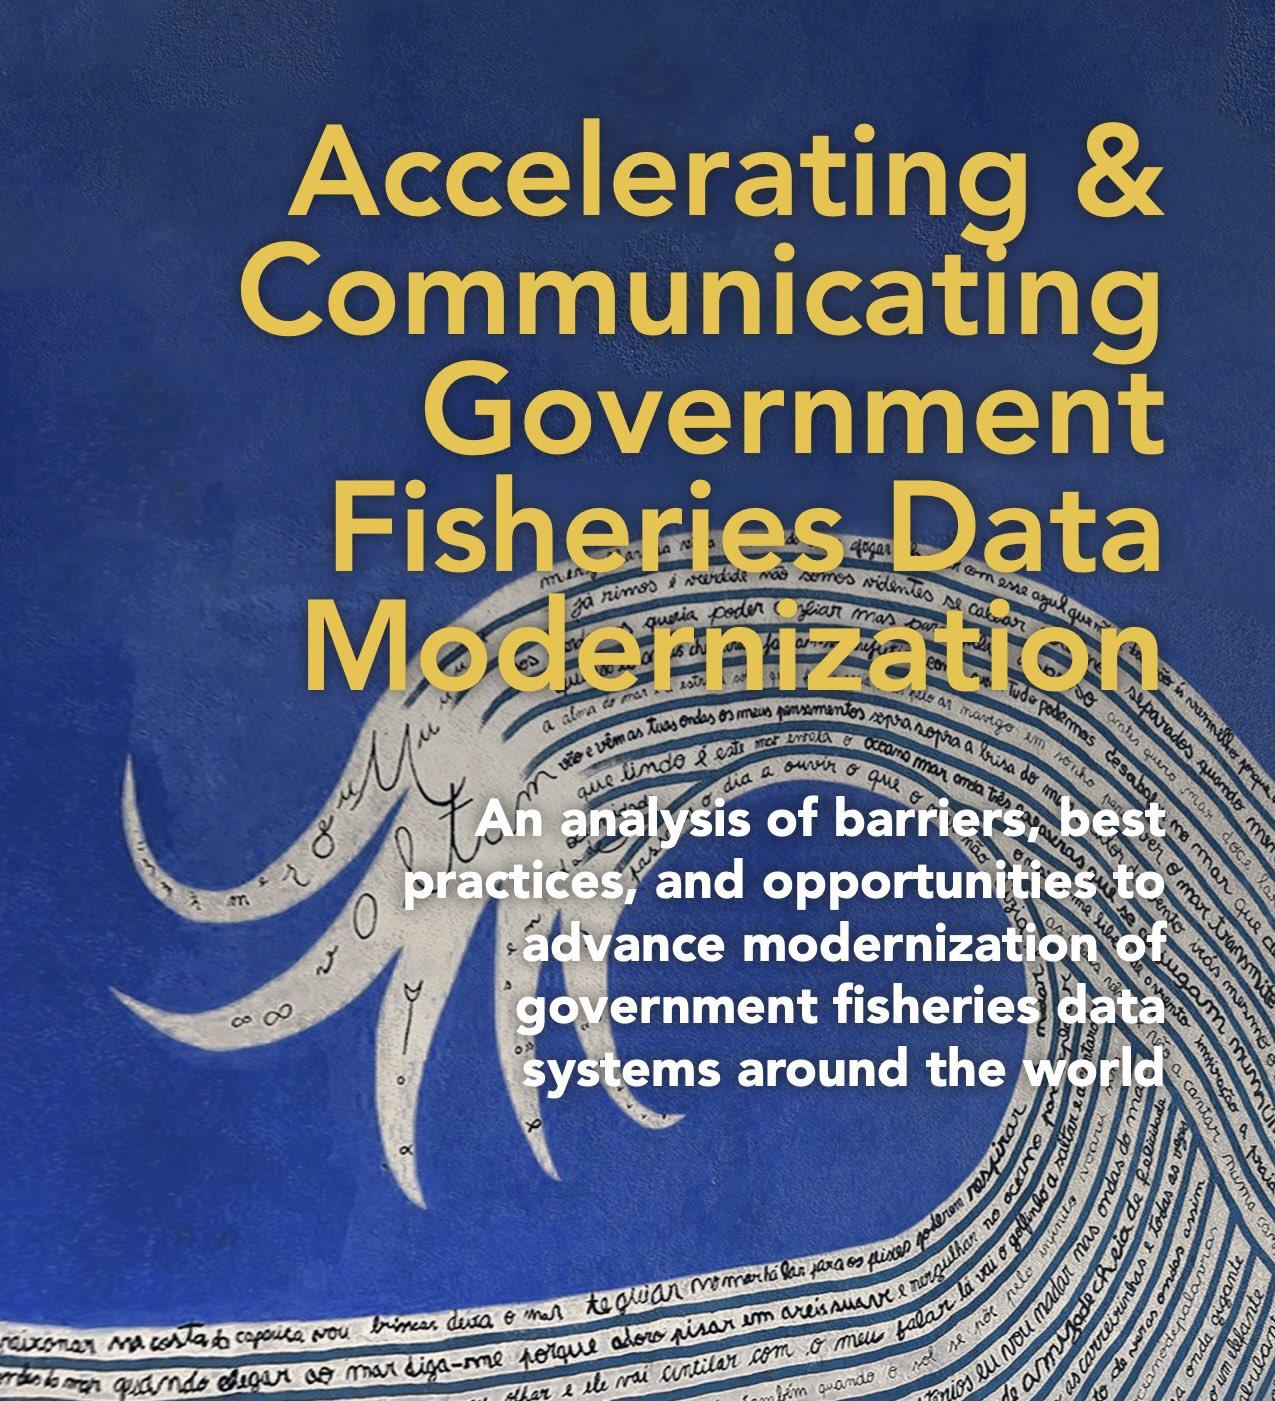 Government Fisheries Data Modernization Resources